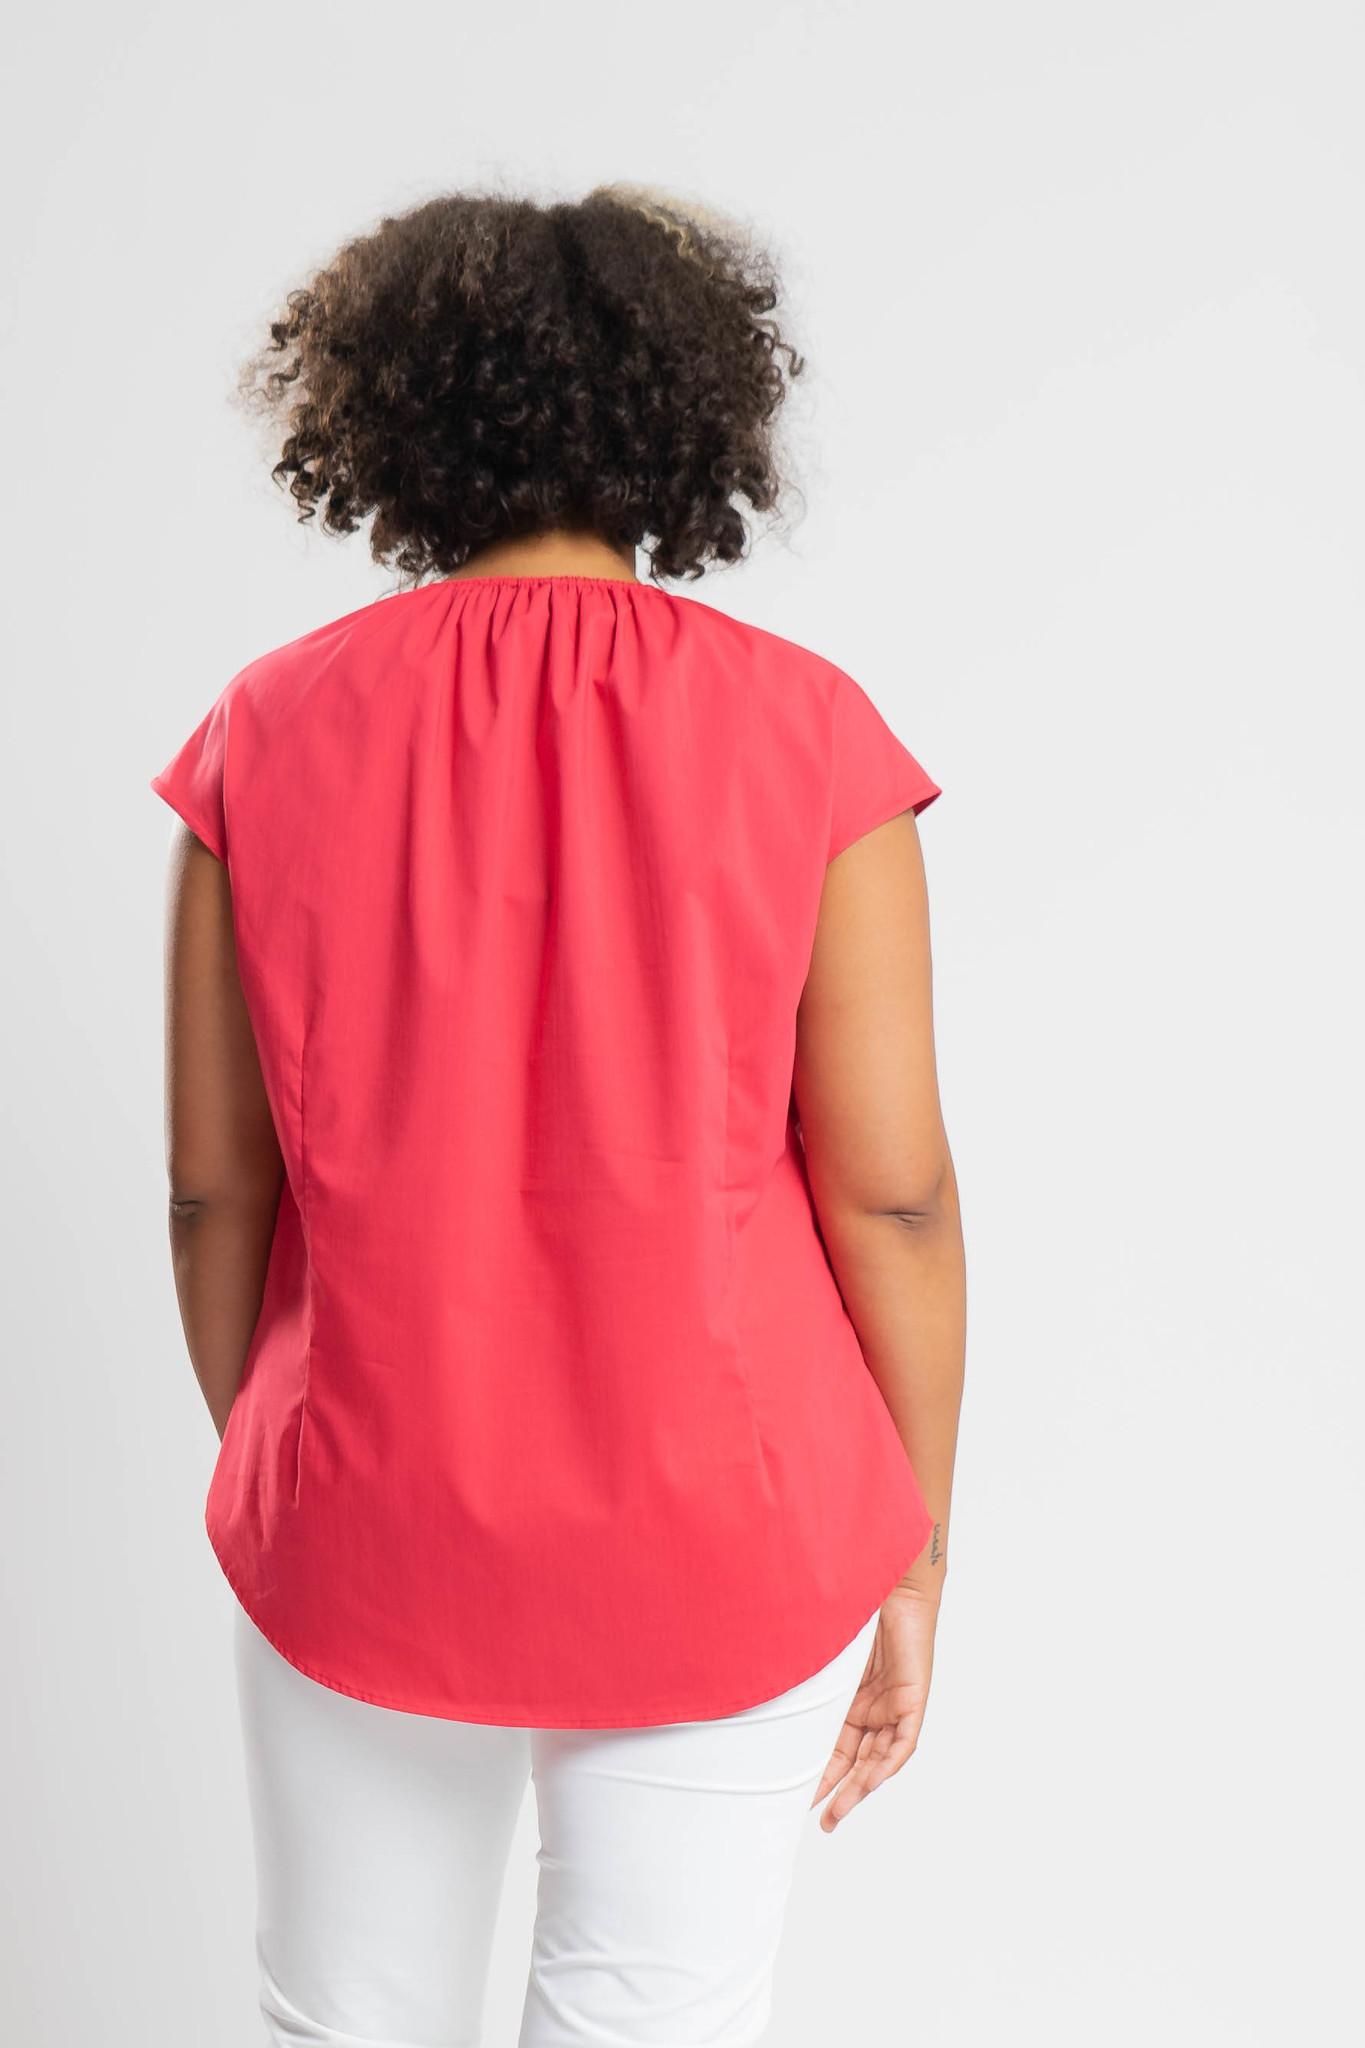 ANZU Shirt aus Bauwoll-Stretch-5